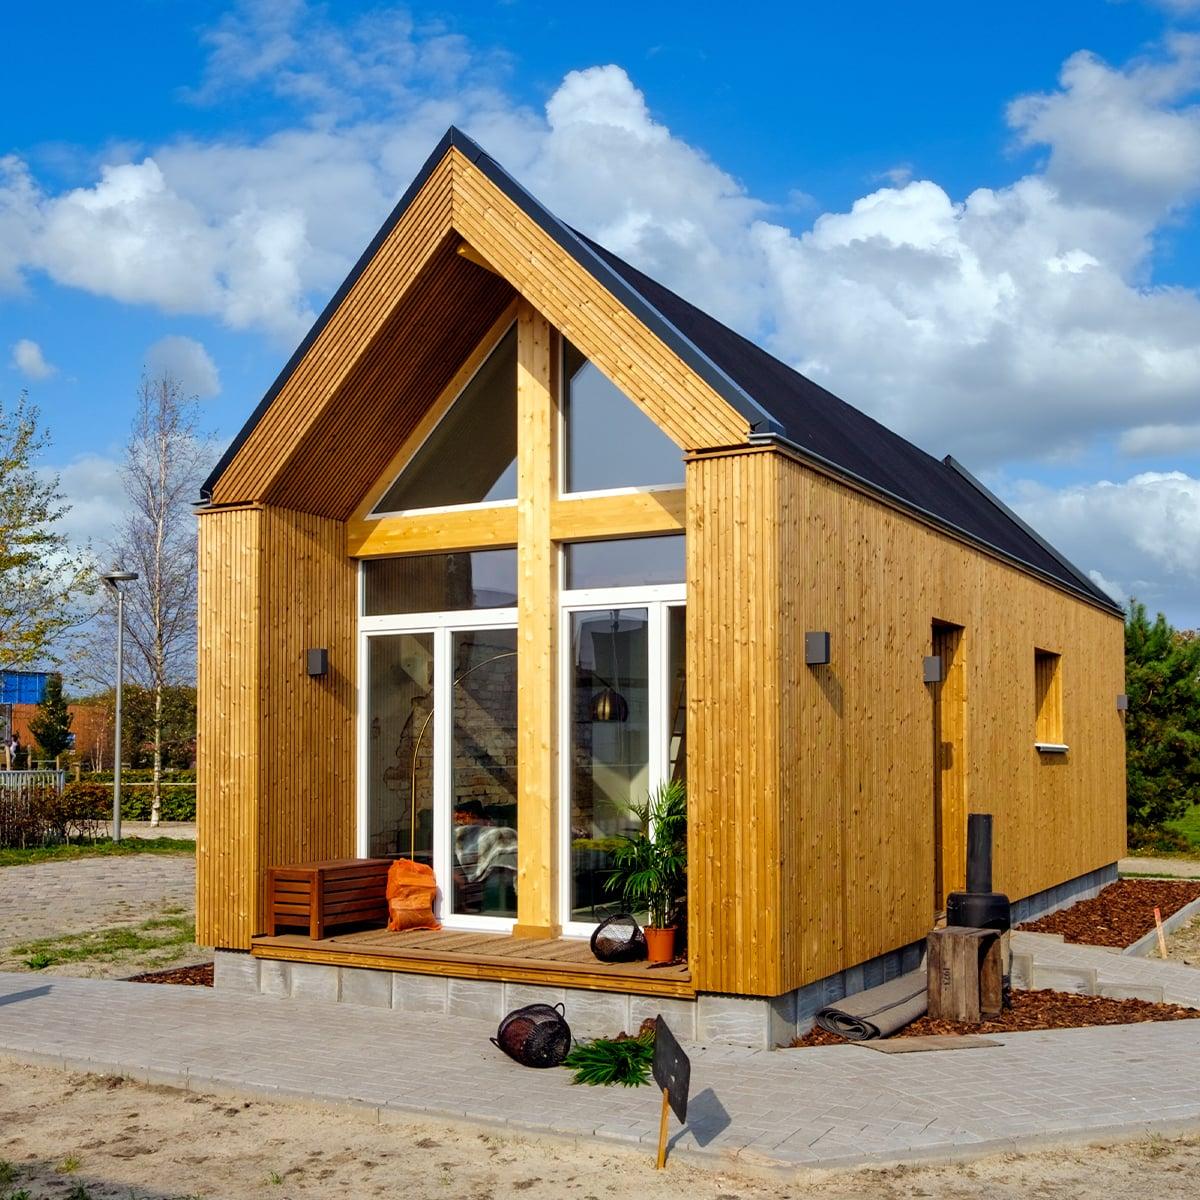 Tiny House aus Holz